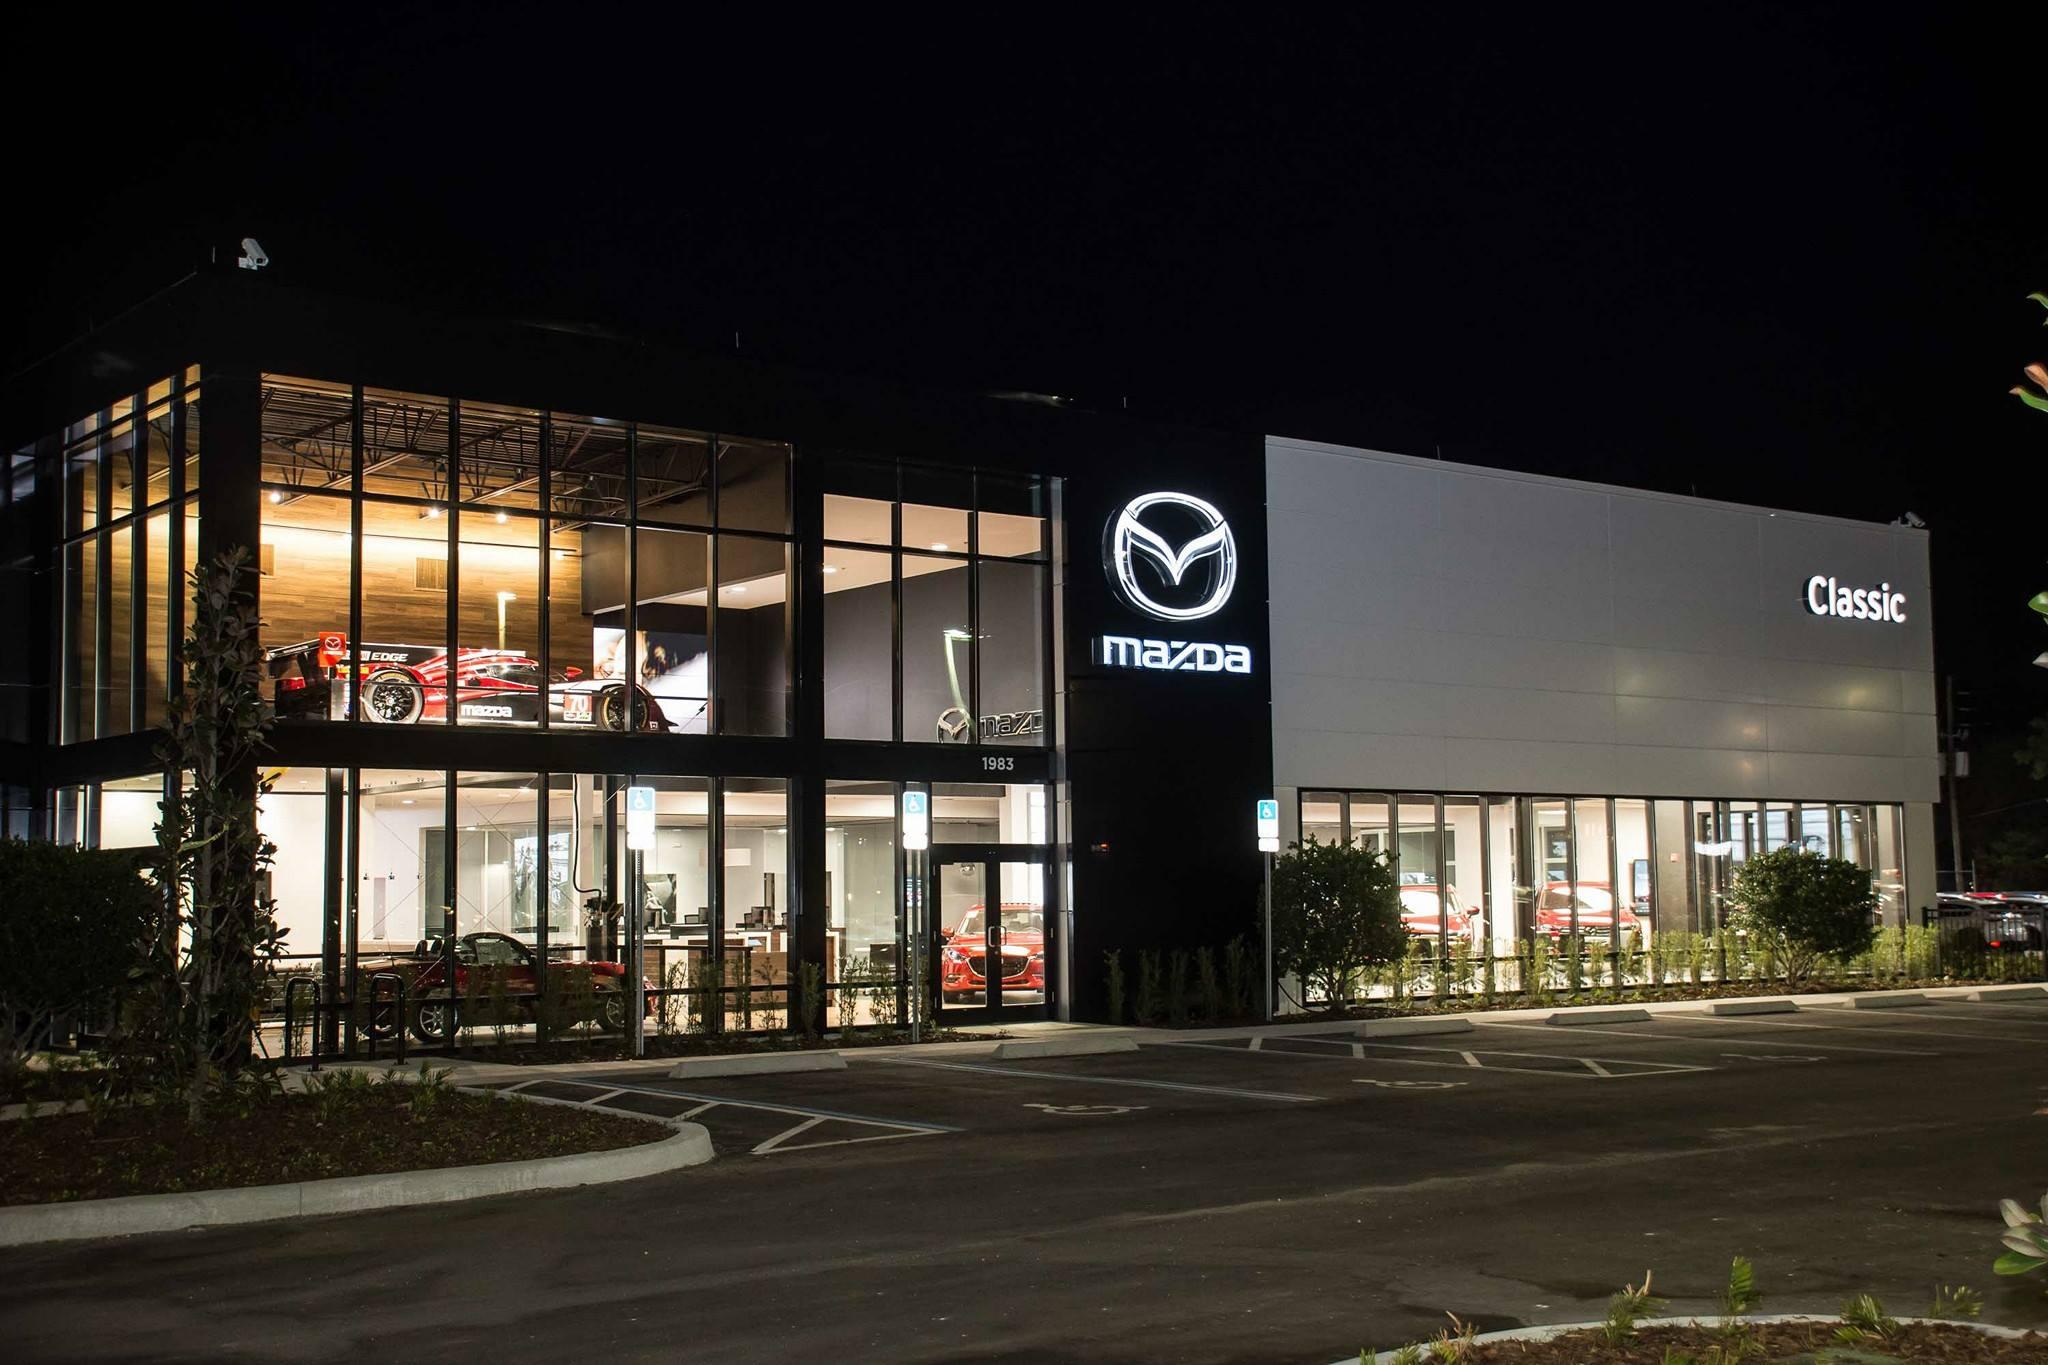 Nuevo 2018 Mazda Mazda6 En Venta | Orlando FL